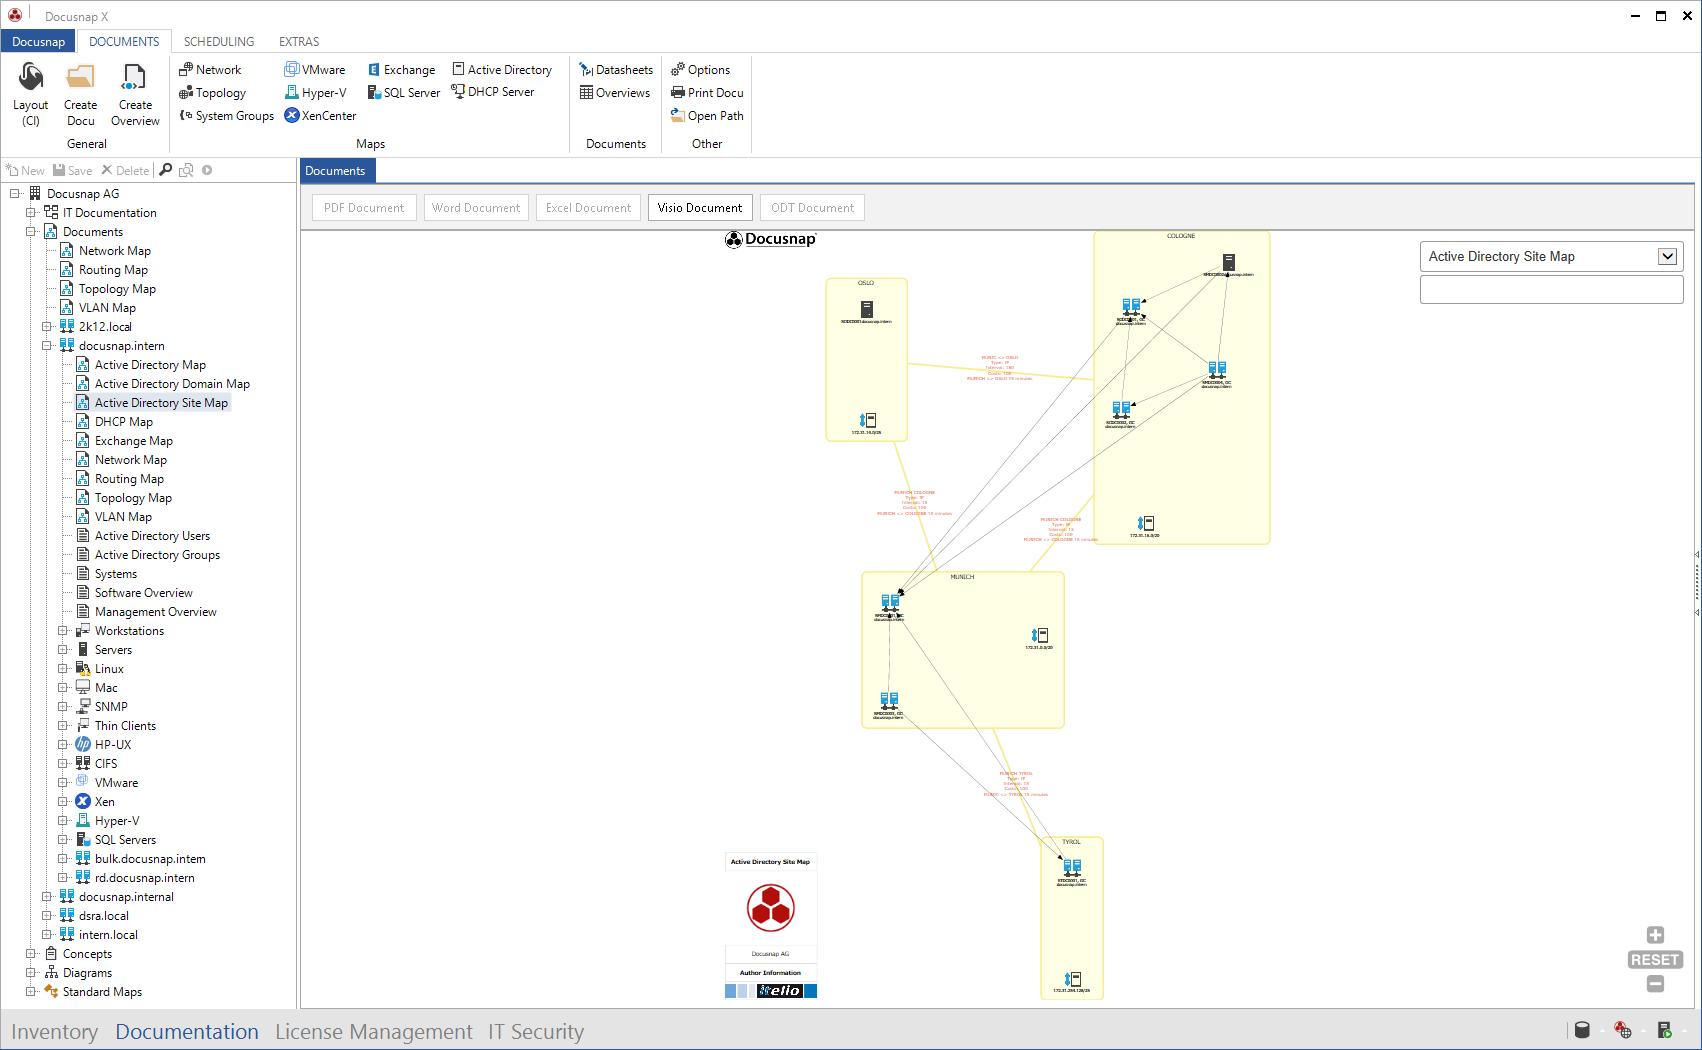 Screenshot: Active Directory Plan